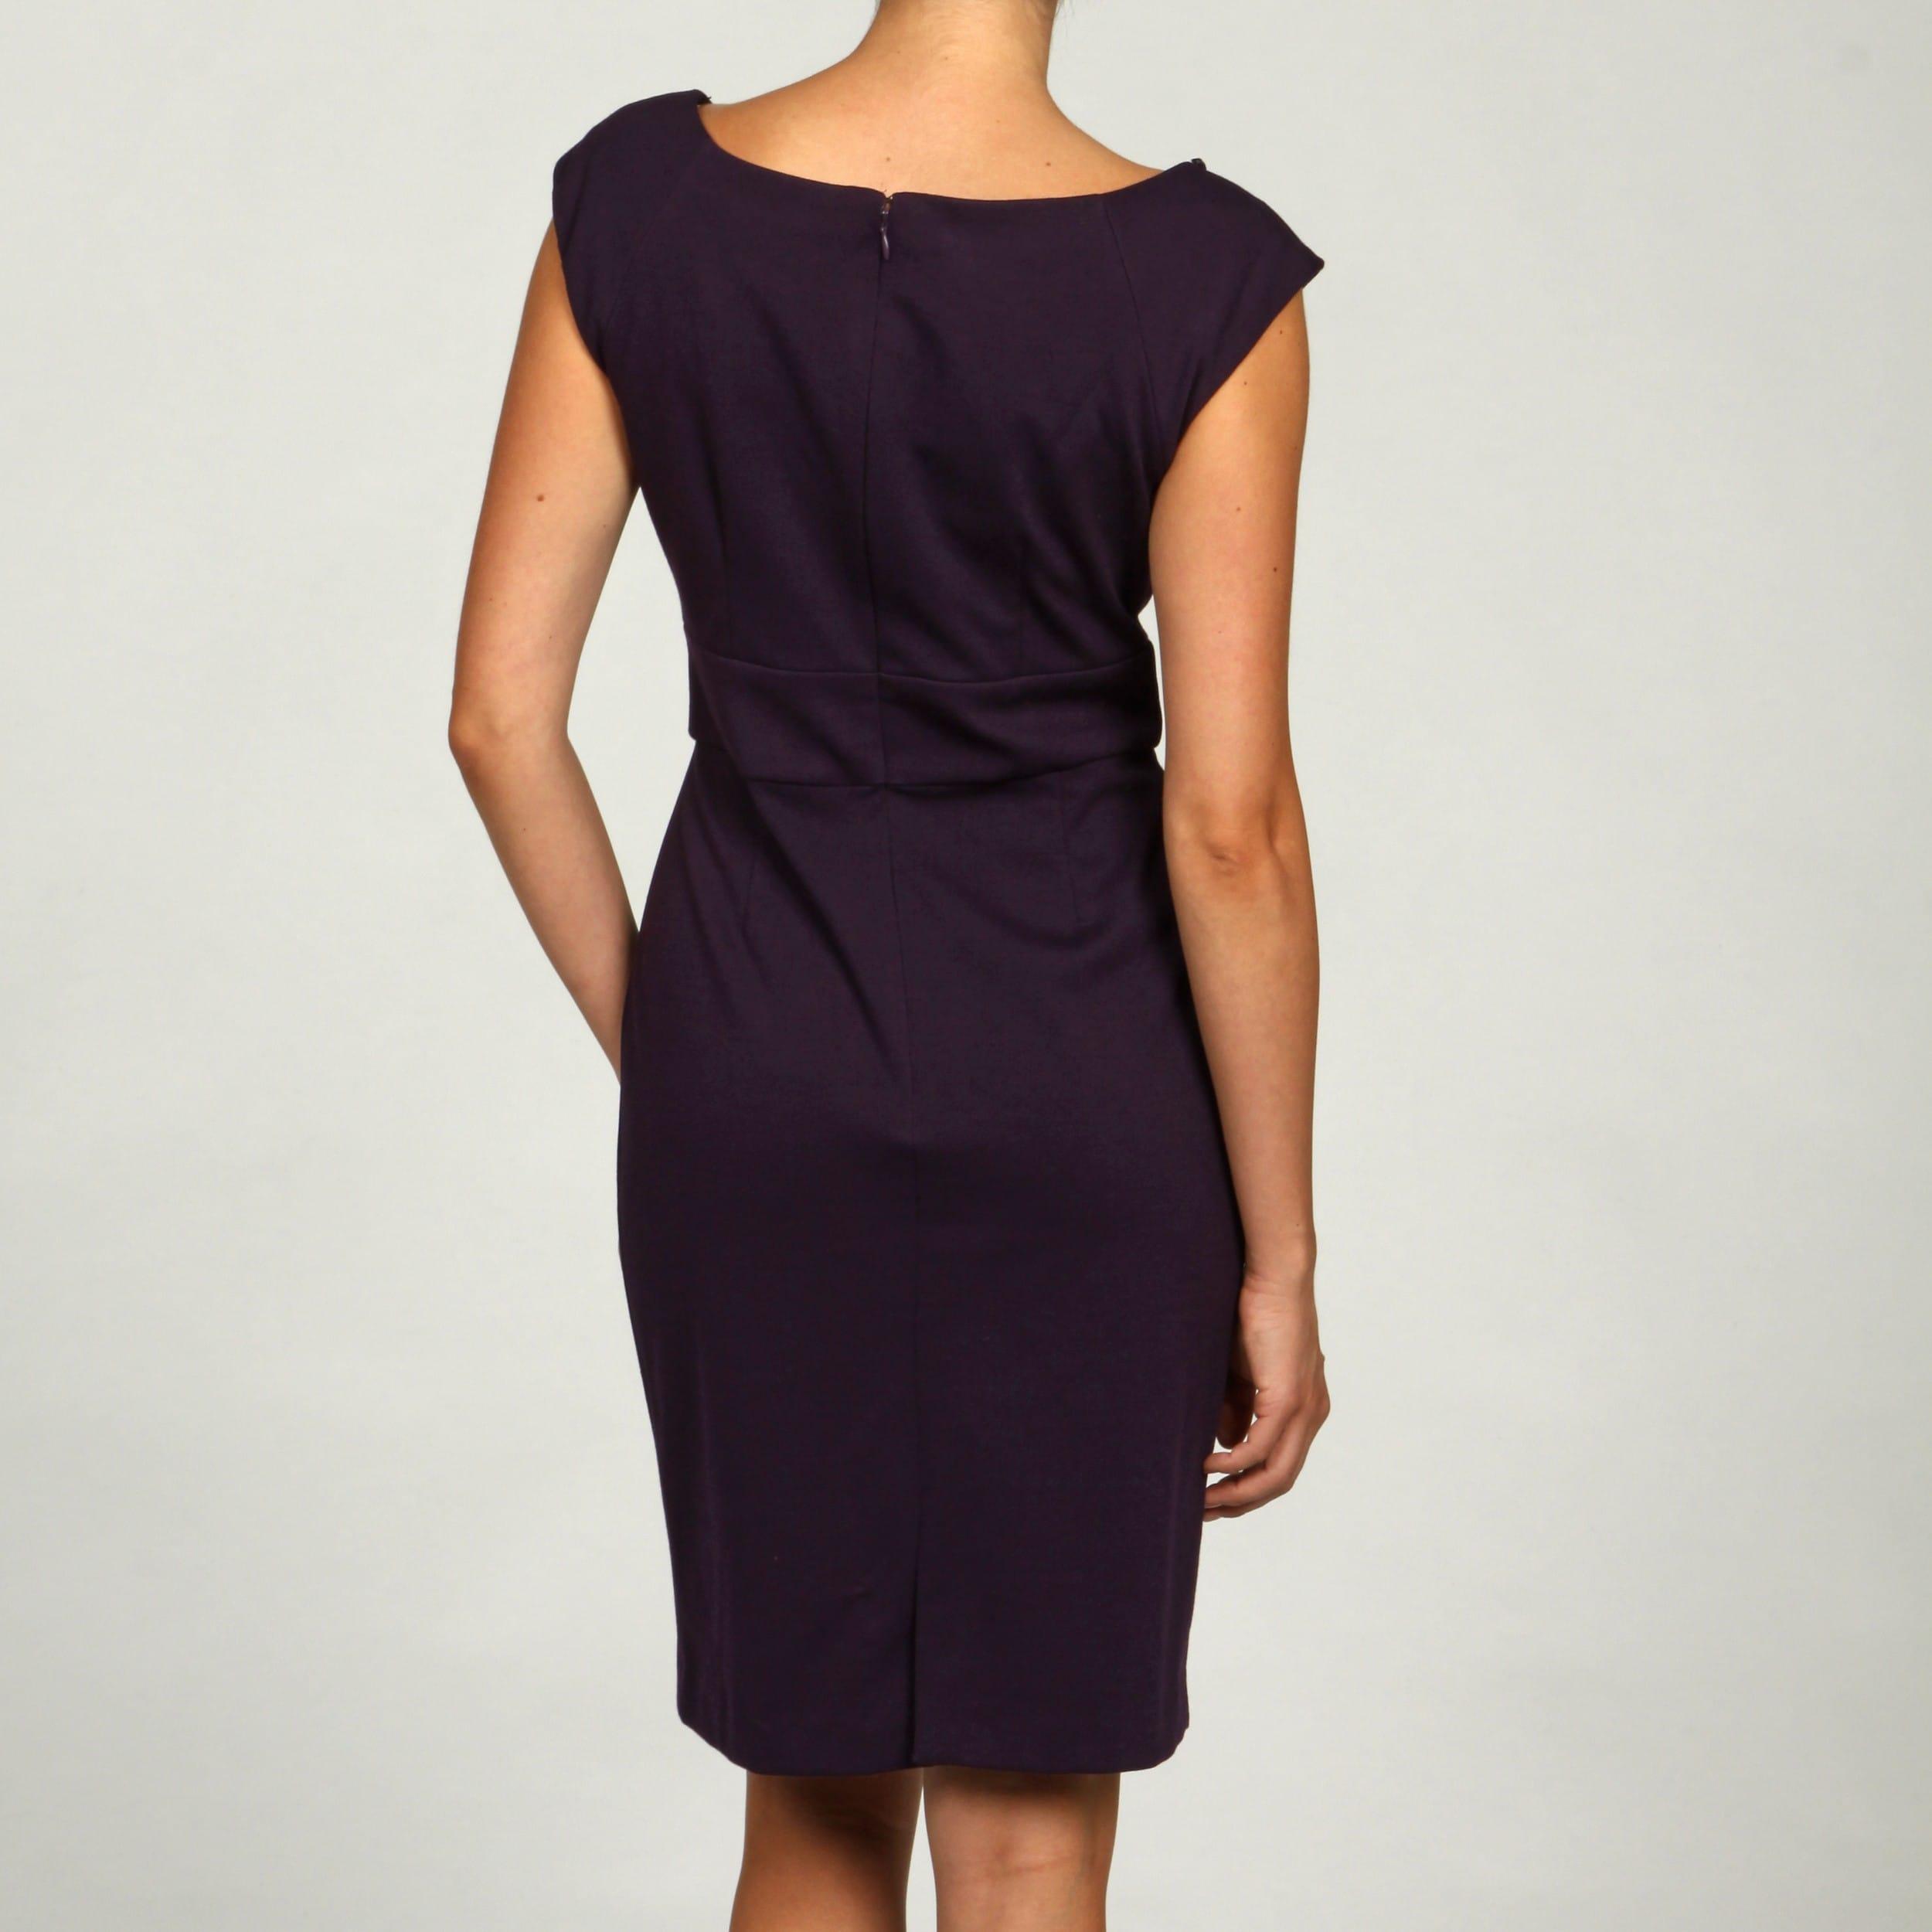 e6ed779f Shop Jessica Howard Women's Eggplant Beaded Ponte Dress - Free Shipping  Today - Overstock - 6089866